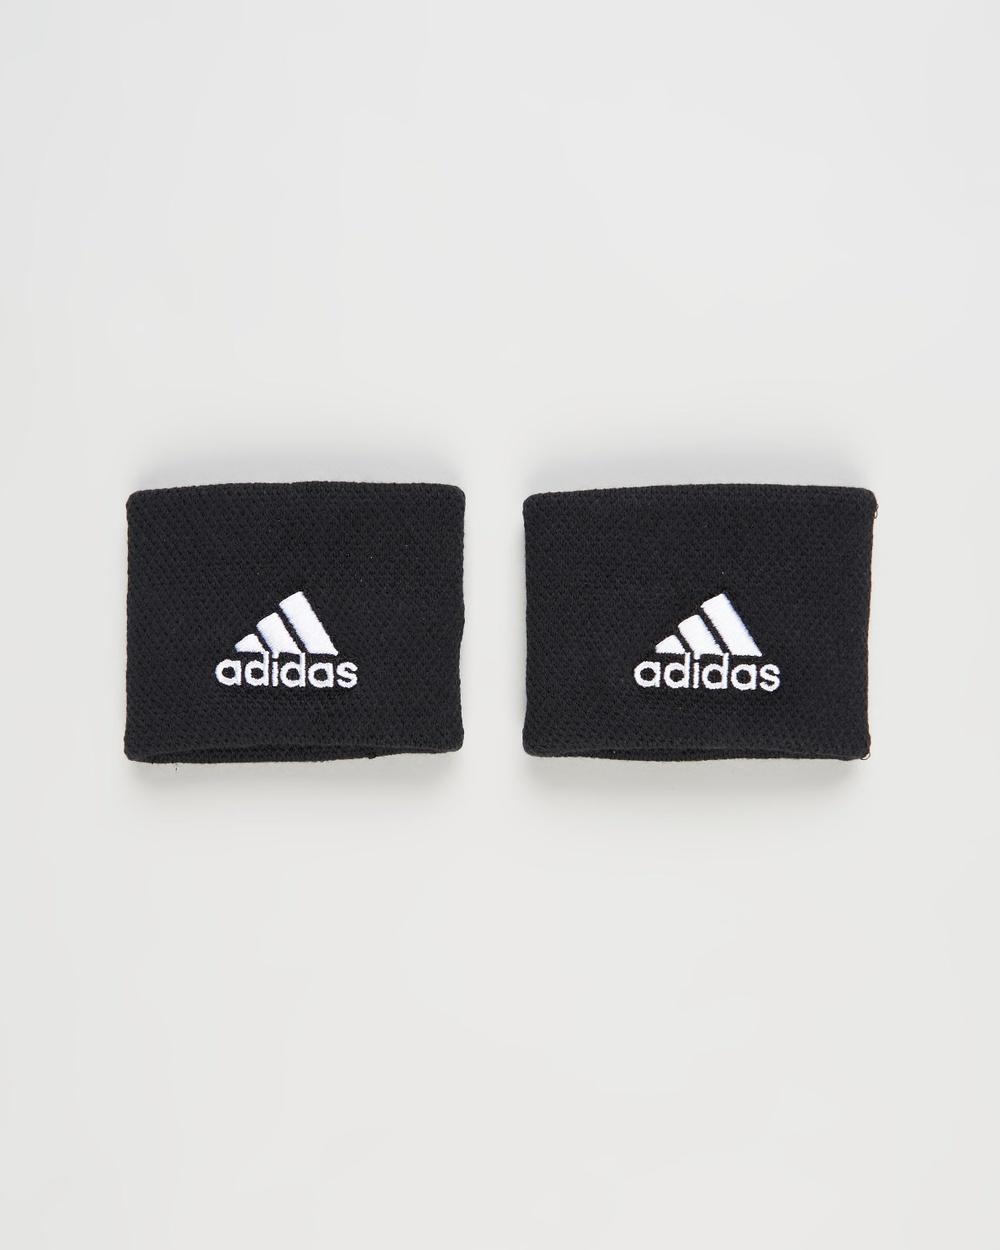 adidas Performance Small Tennis Wristbands Unisex Sweat Bands Black & White